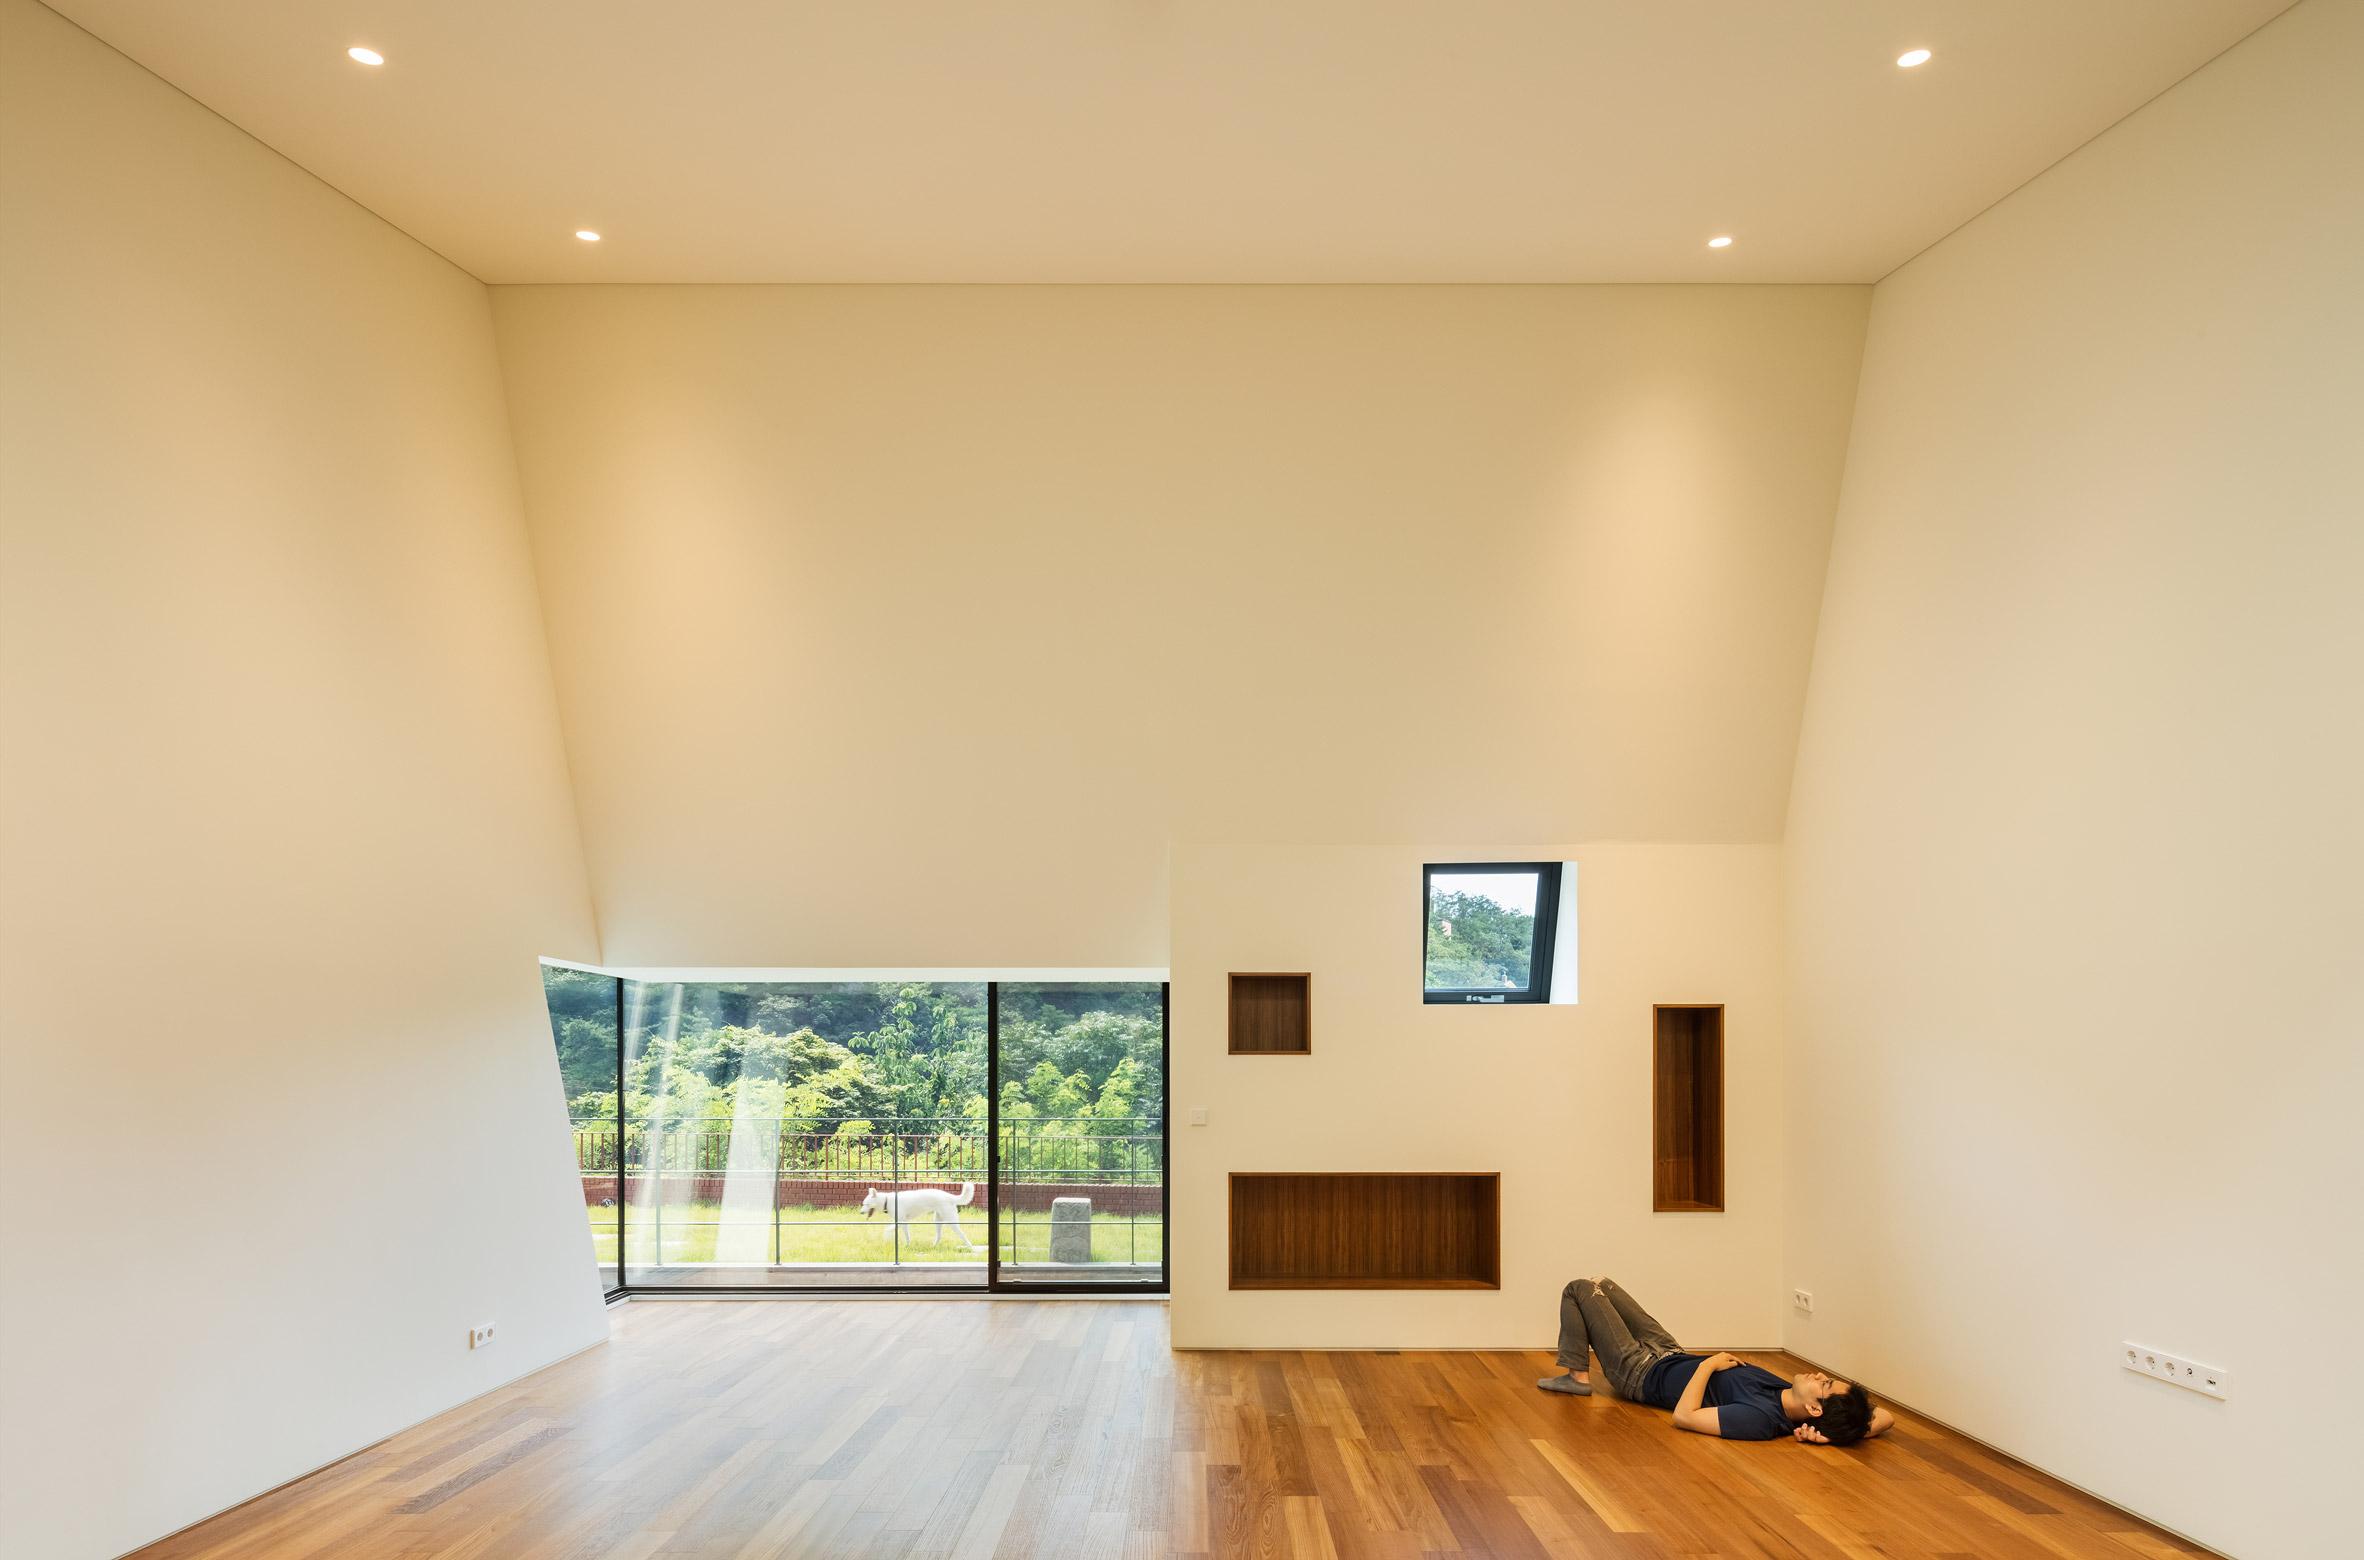 Etienne de souza designer and manufacturer of luxury cabinet - Deep House By Poly M Ur